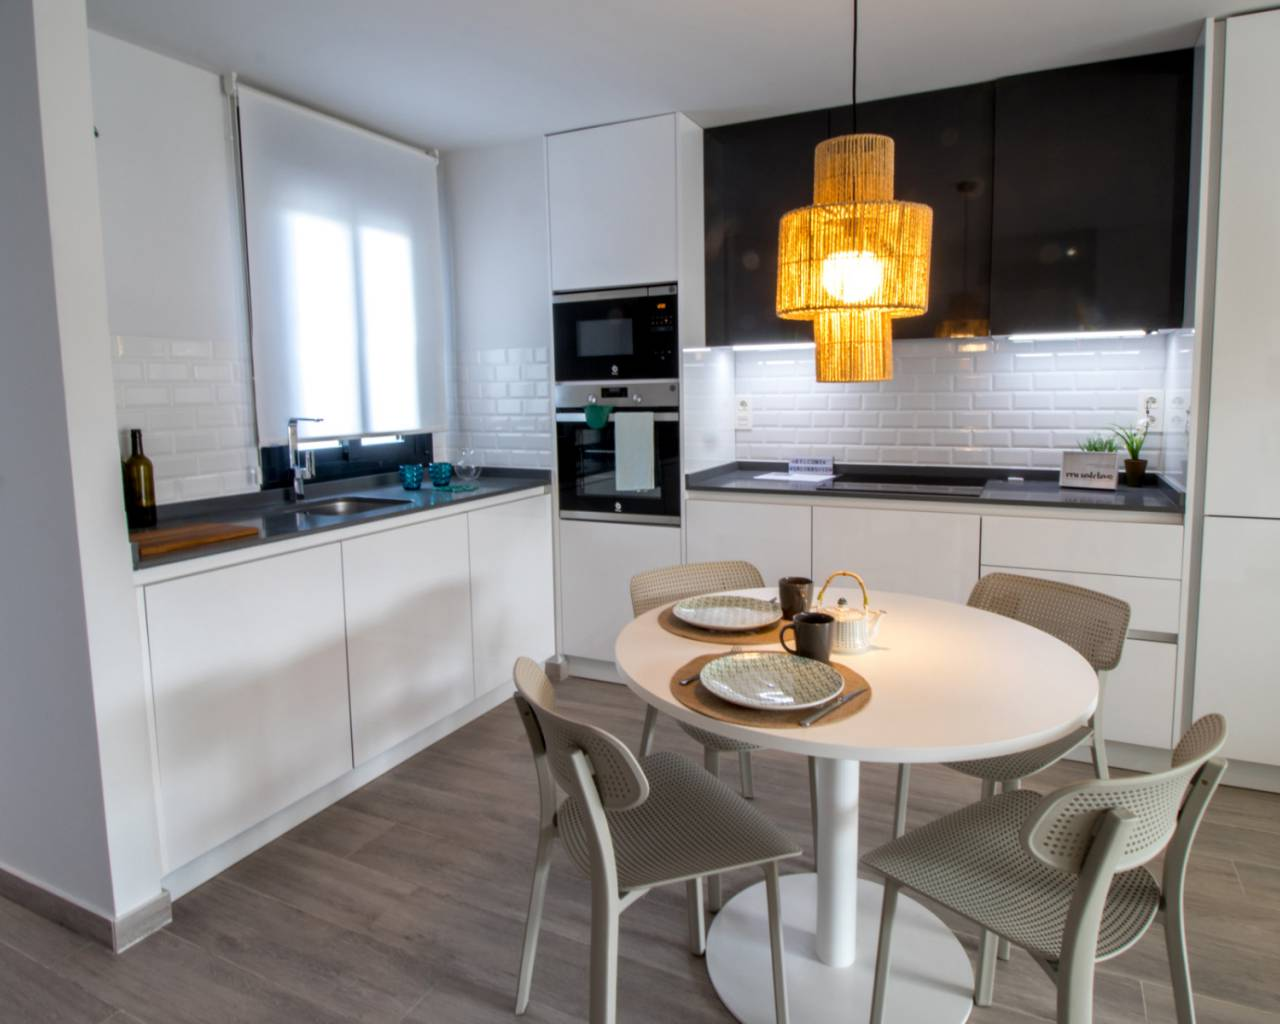 nieuwbouw-appartement-san-miguel-de-salinas_1790_xl